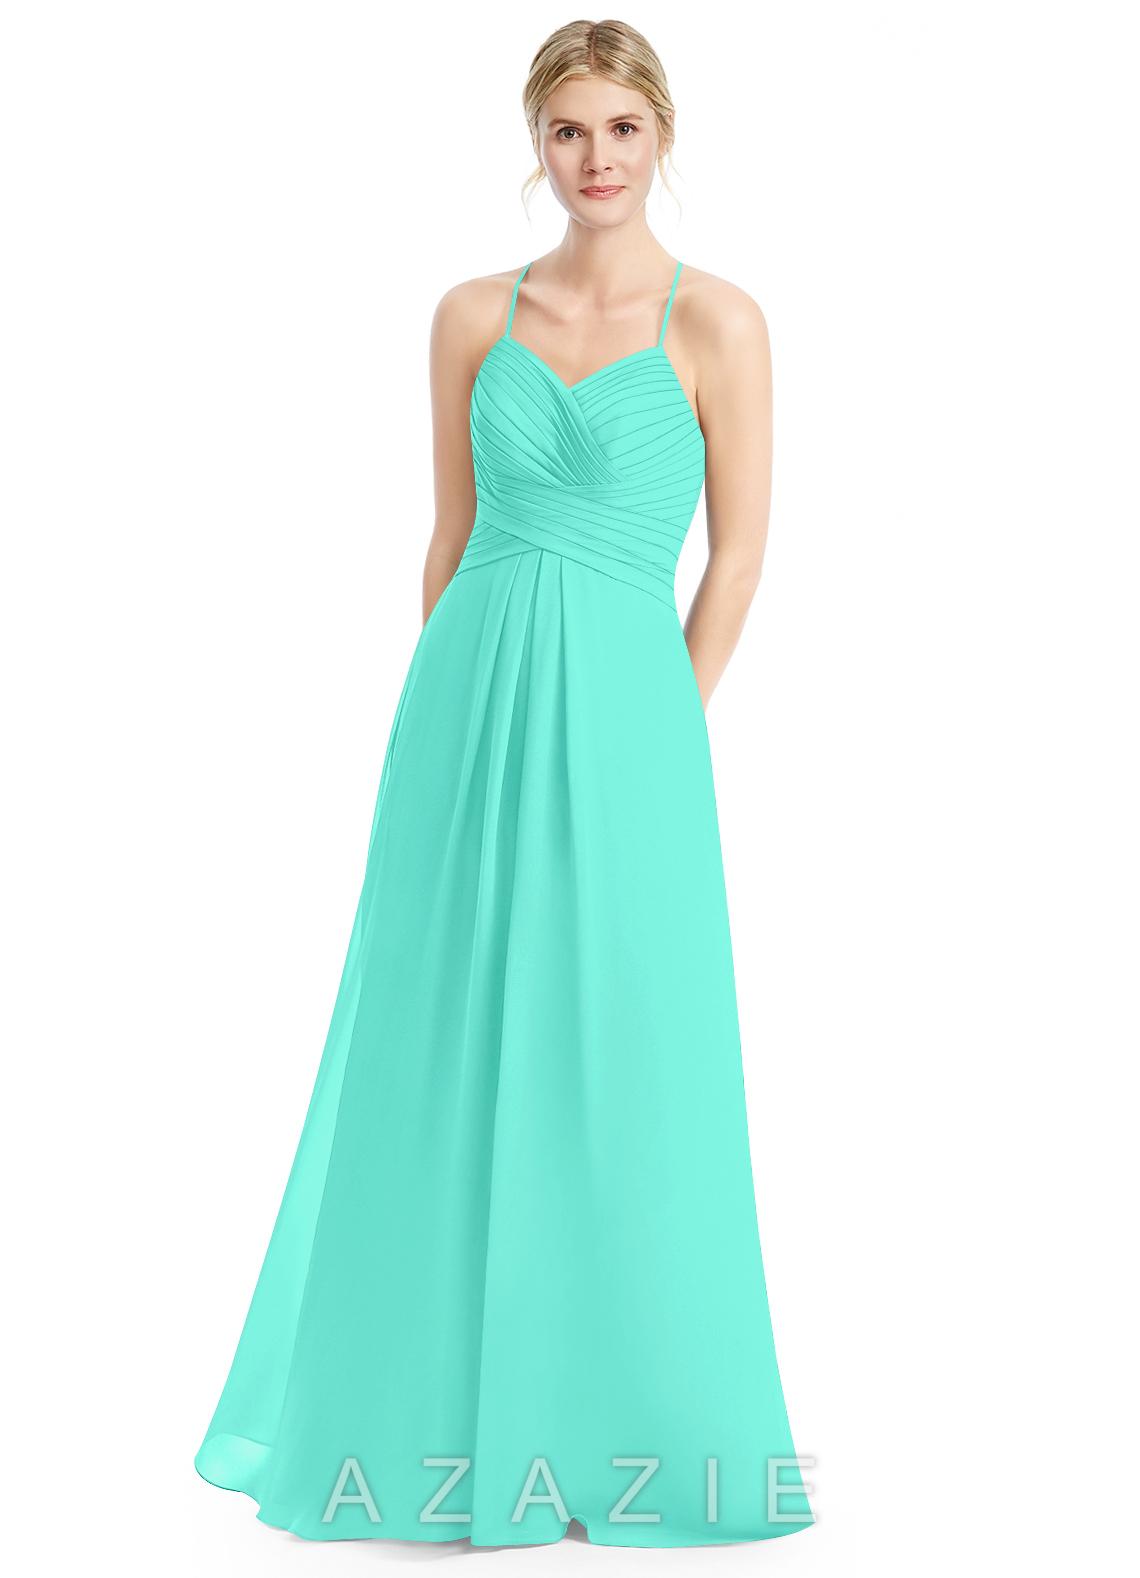 Azazie Cecilia Bridesmaid Dress | Azazie